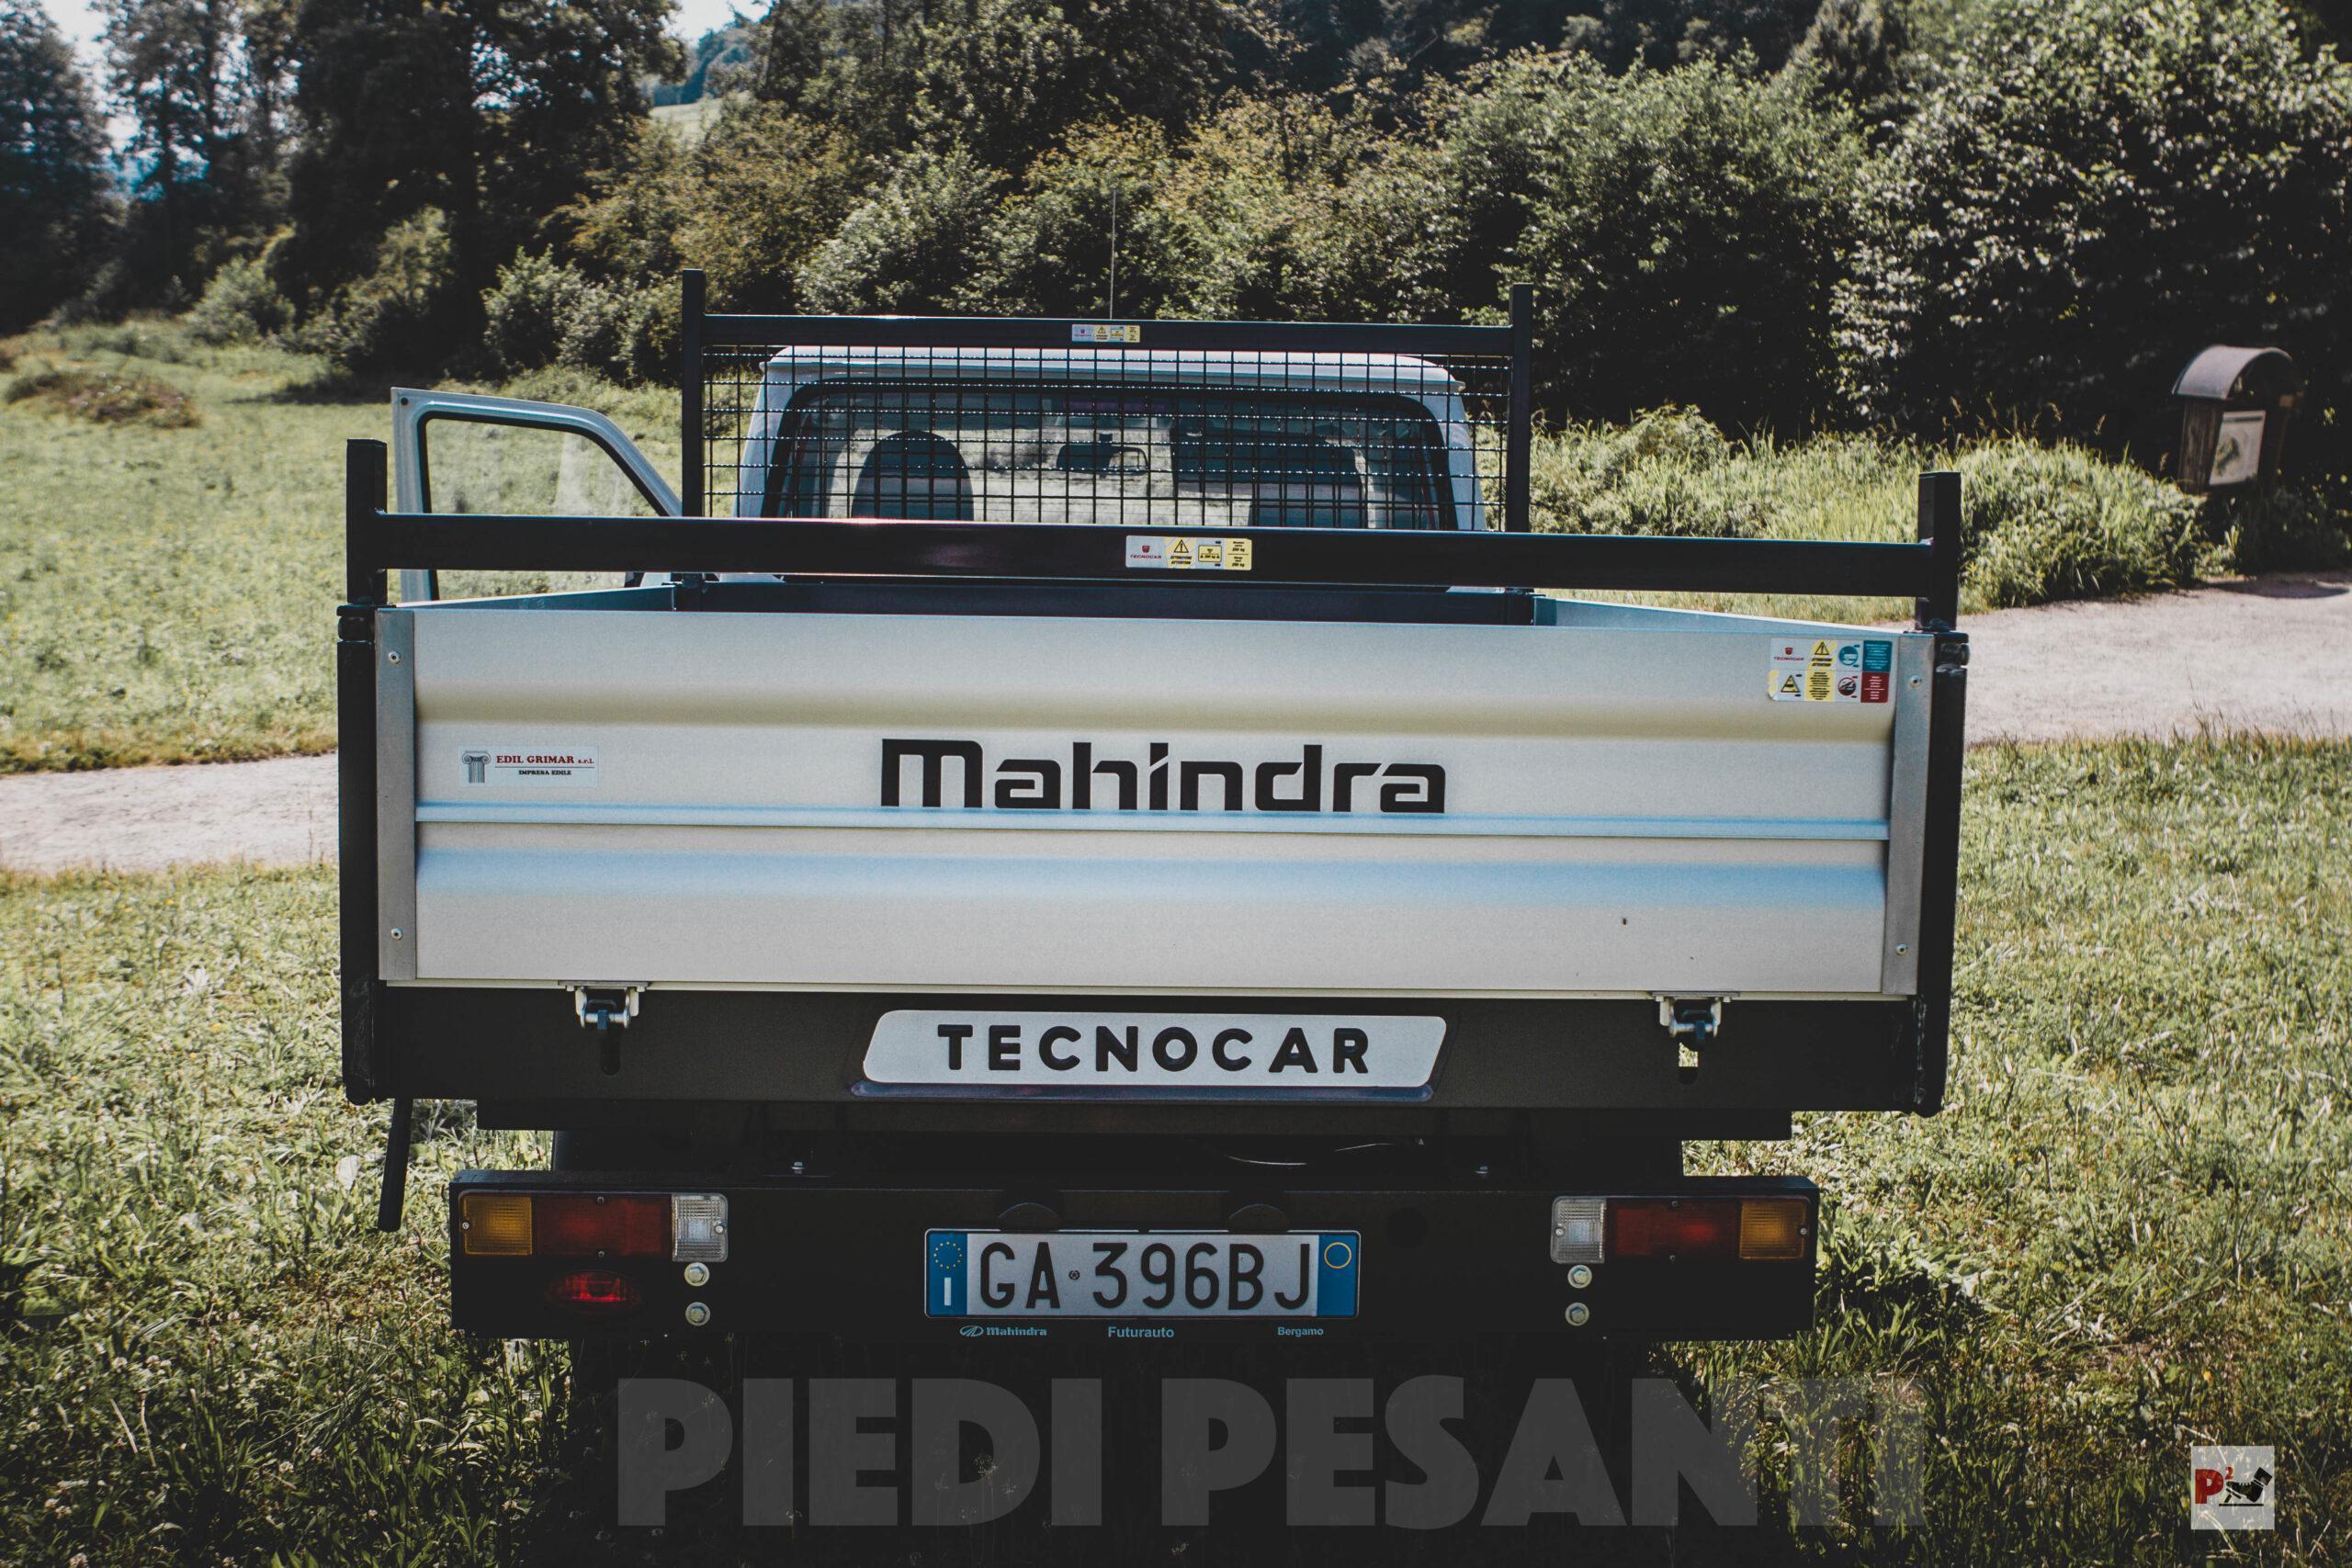 Mahindra Goa 4x4